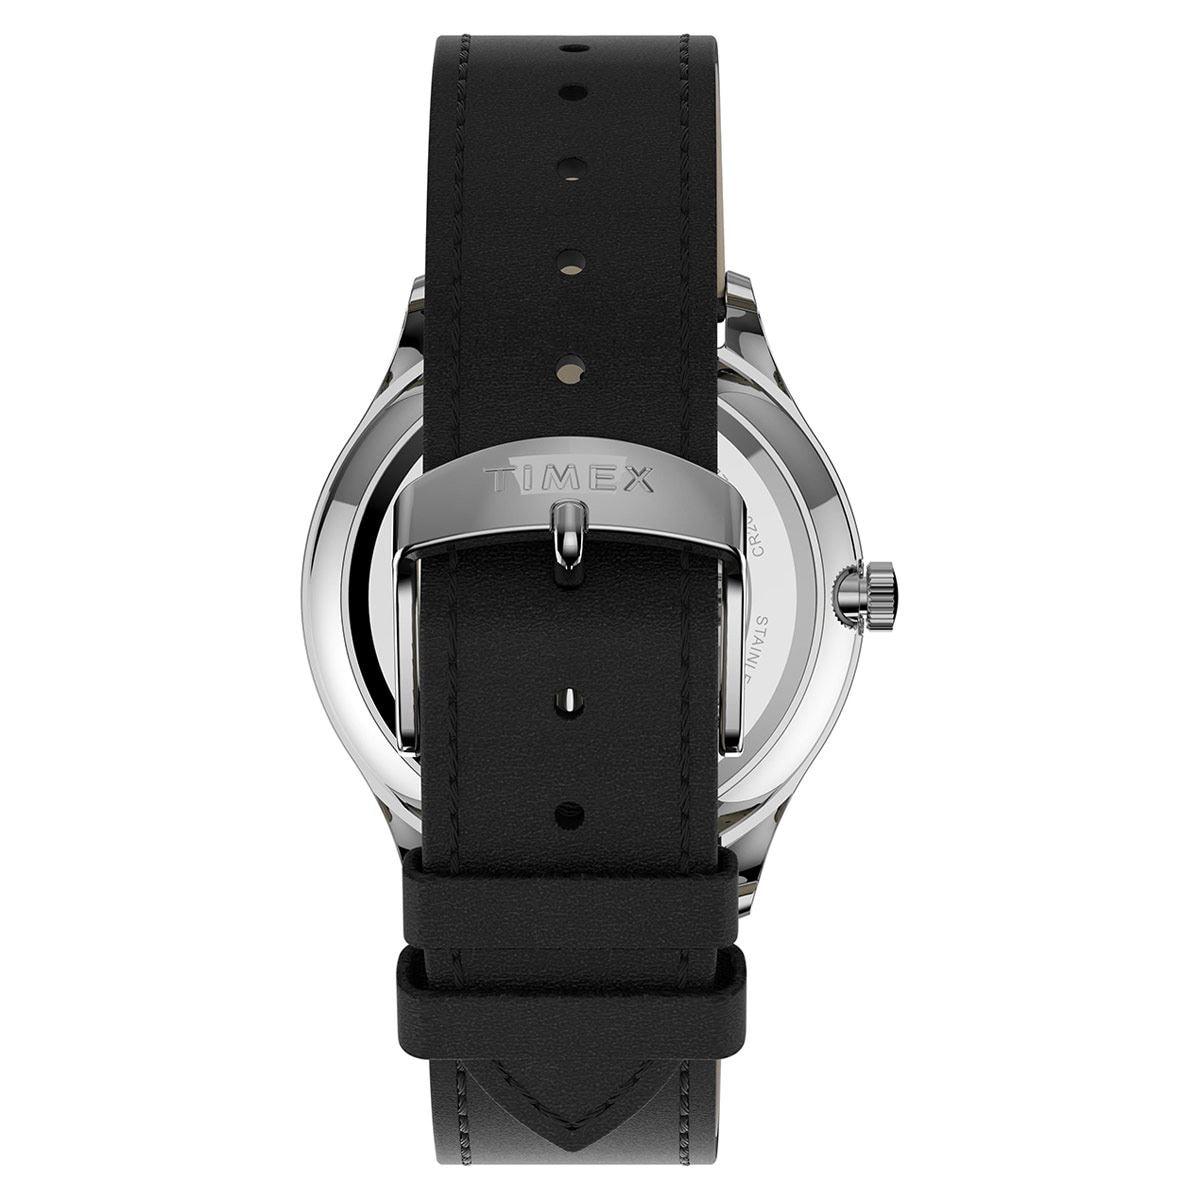 Reloj Timex TW2T71900 de Caballero